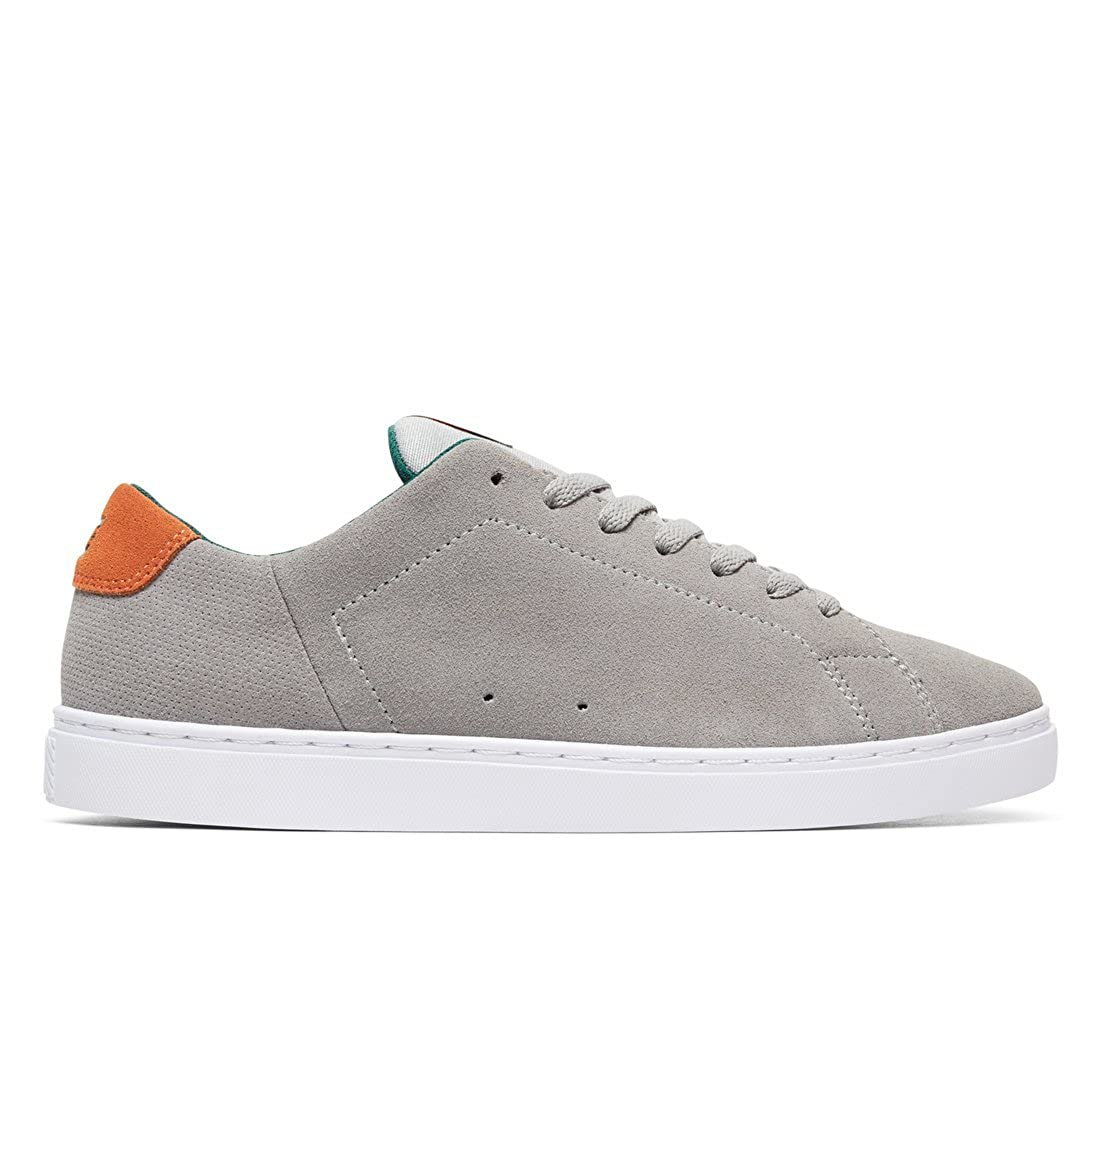 DC schuhe Reprieve - Schuhe für Männer ADYS100409